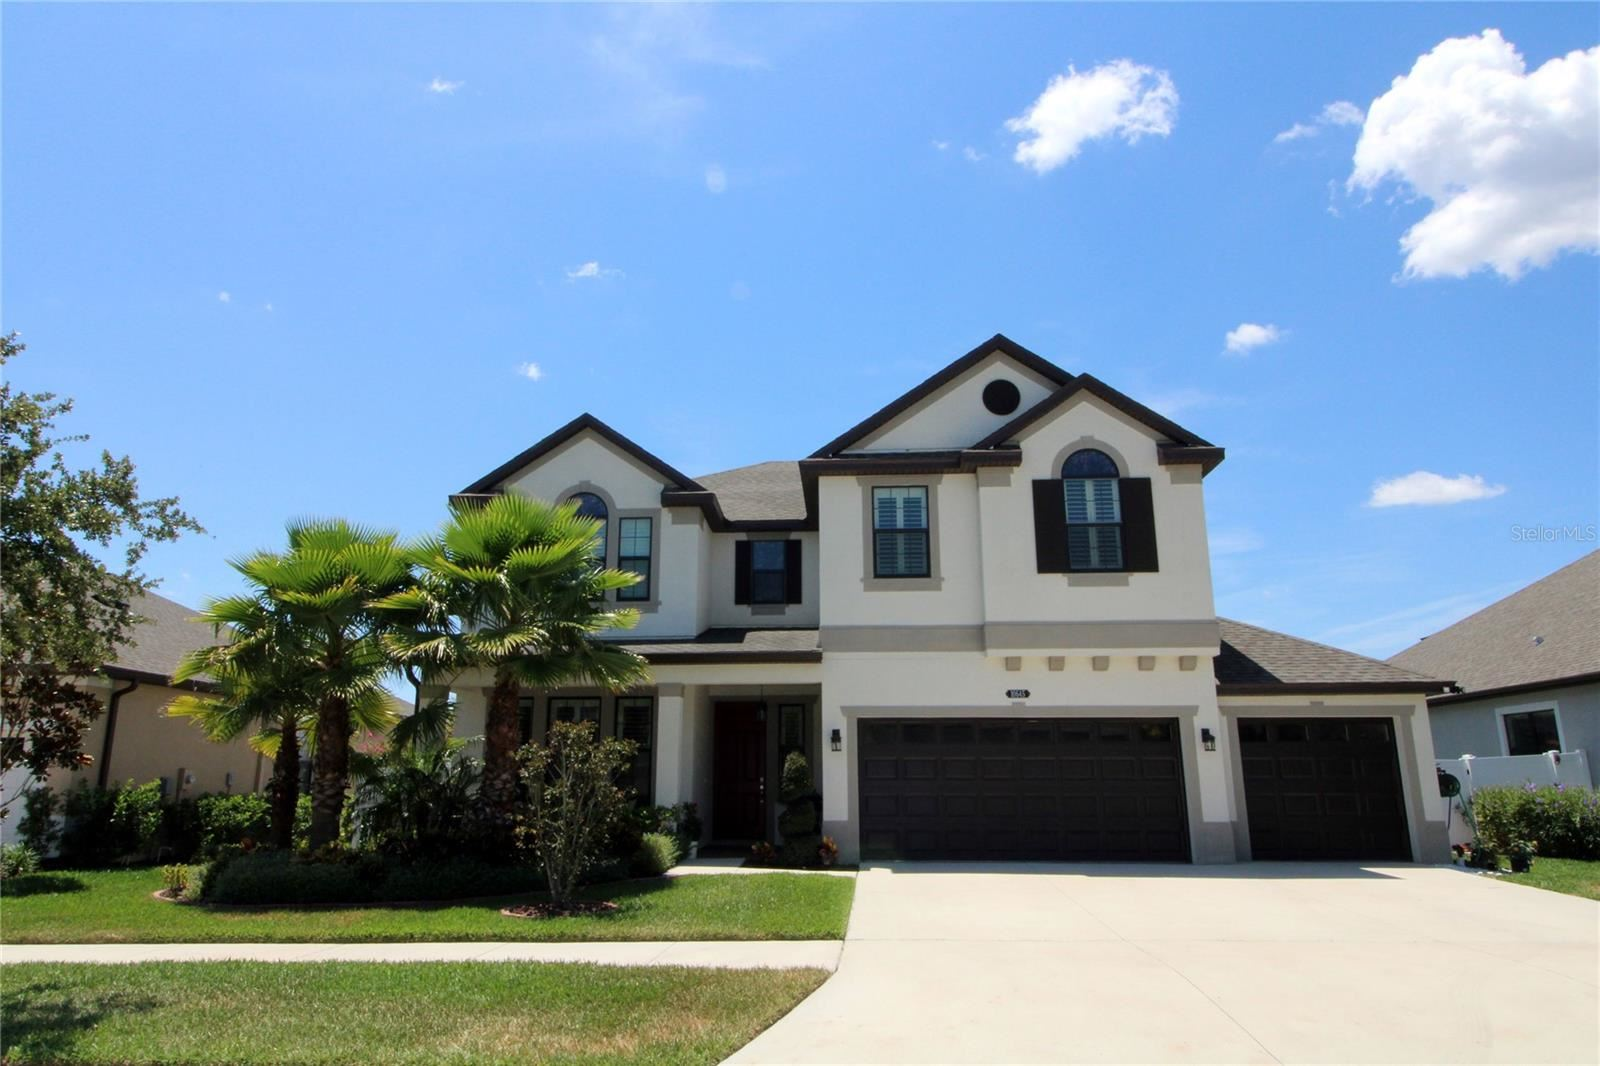 10645 MISTFLOWER LANE, Tampa, FL 33647 - MLS#: T3309892